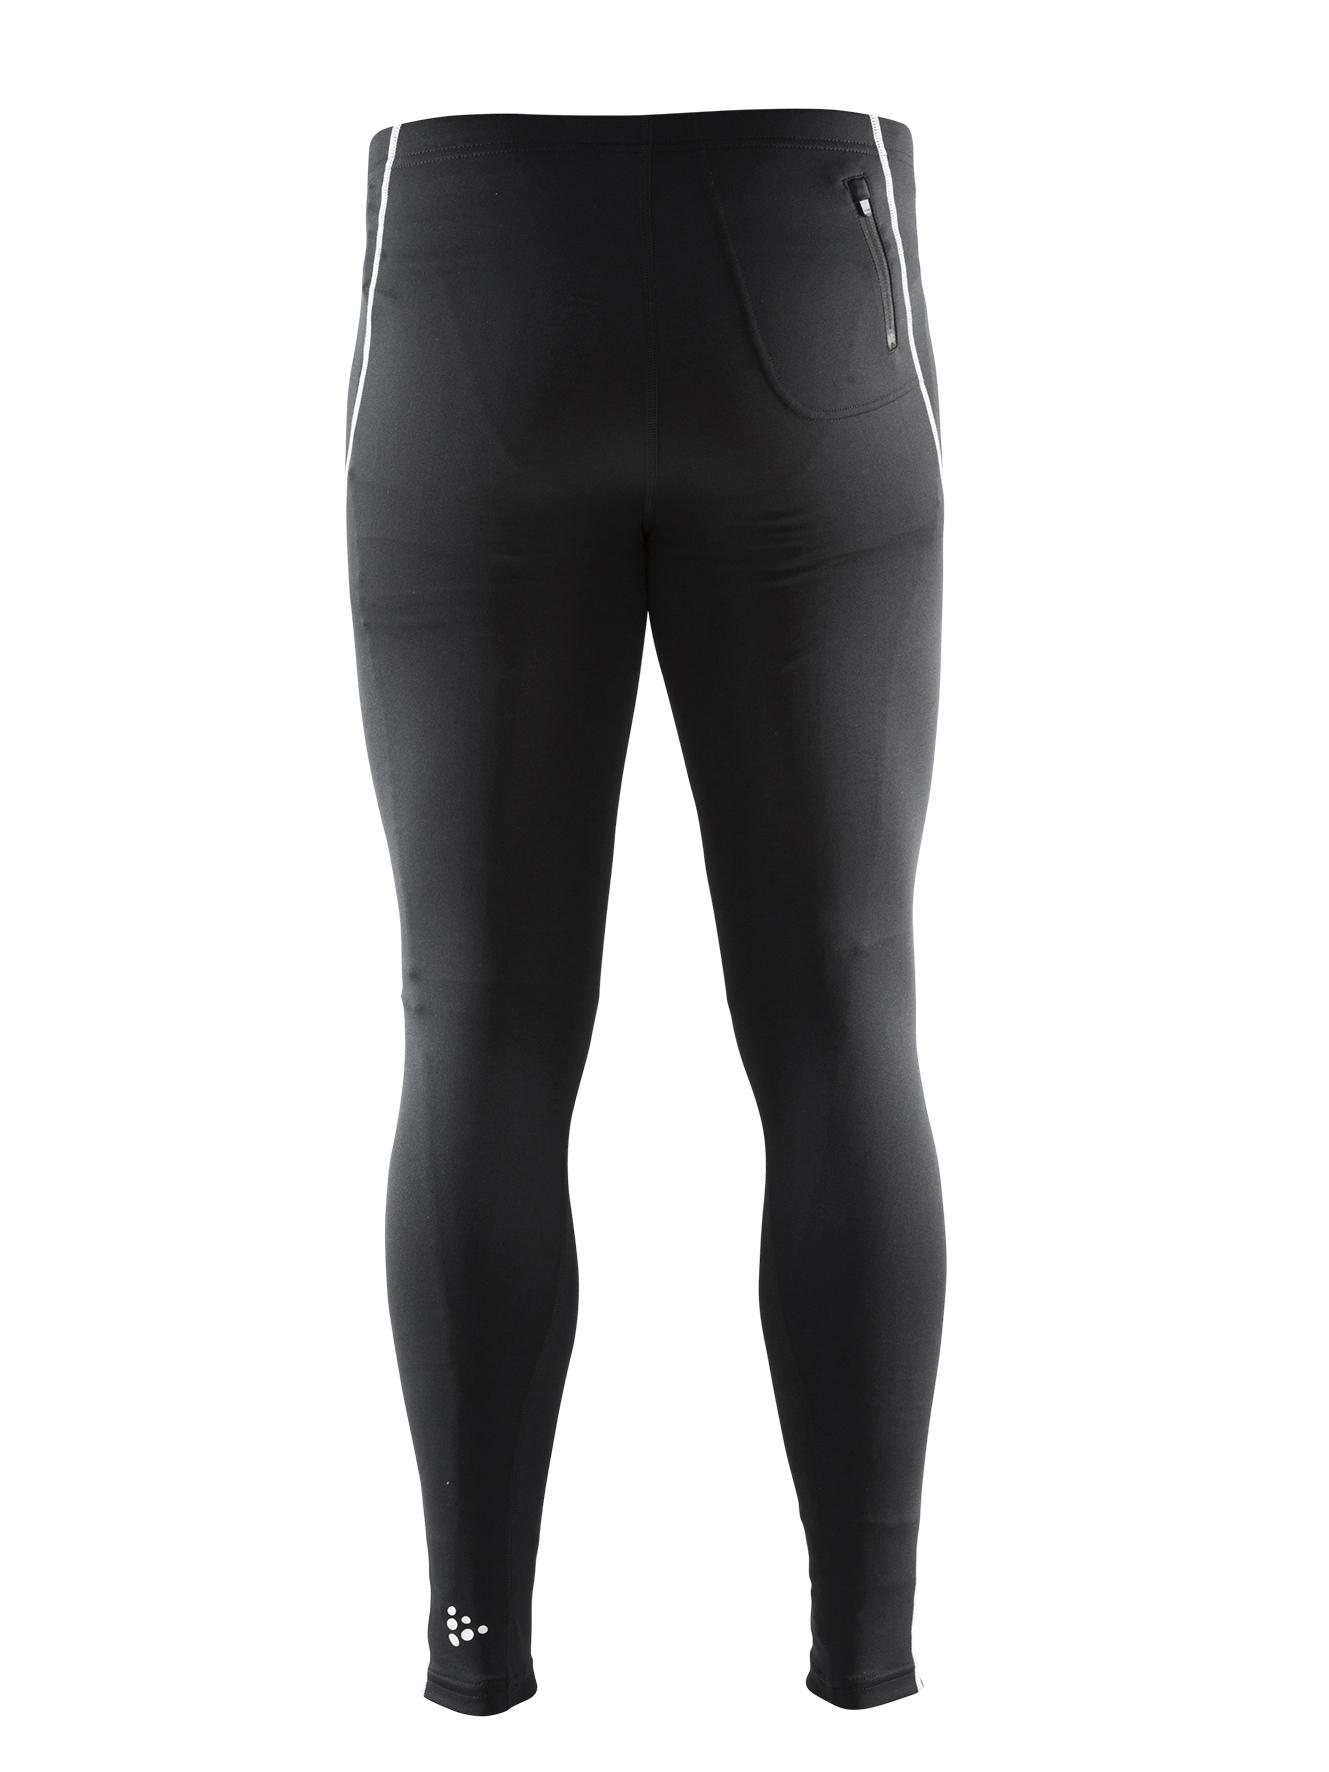 Craft Mind Run мужской костюм для бега темно-синий - 3